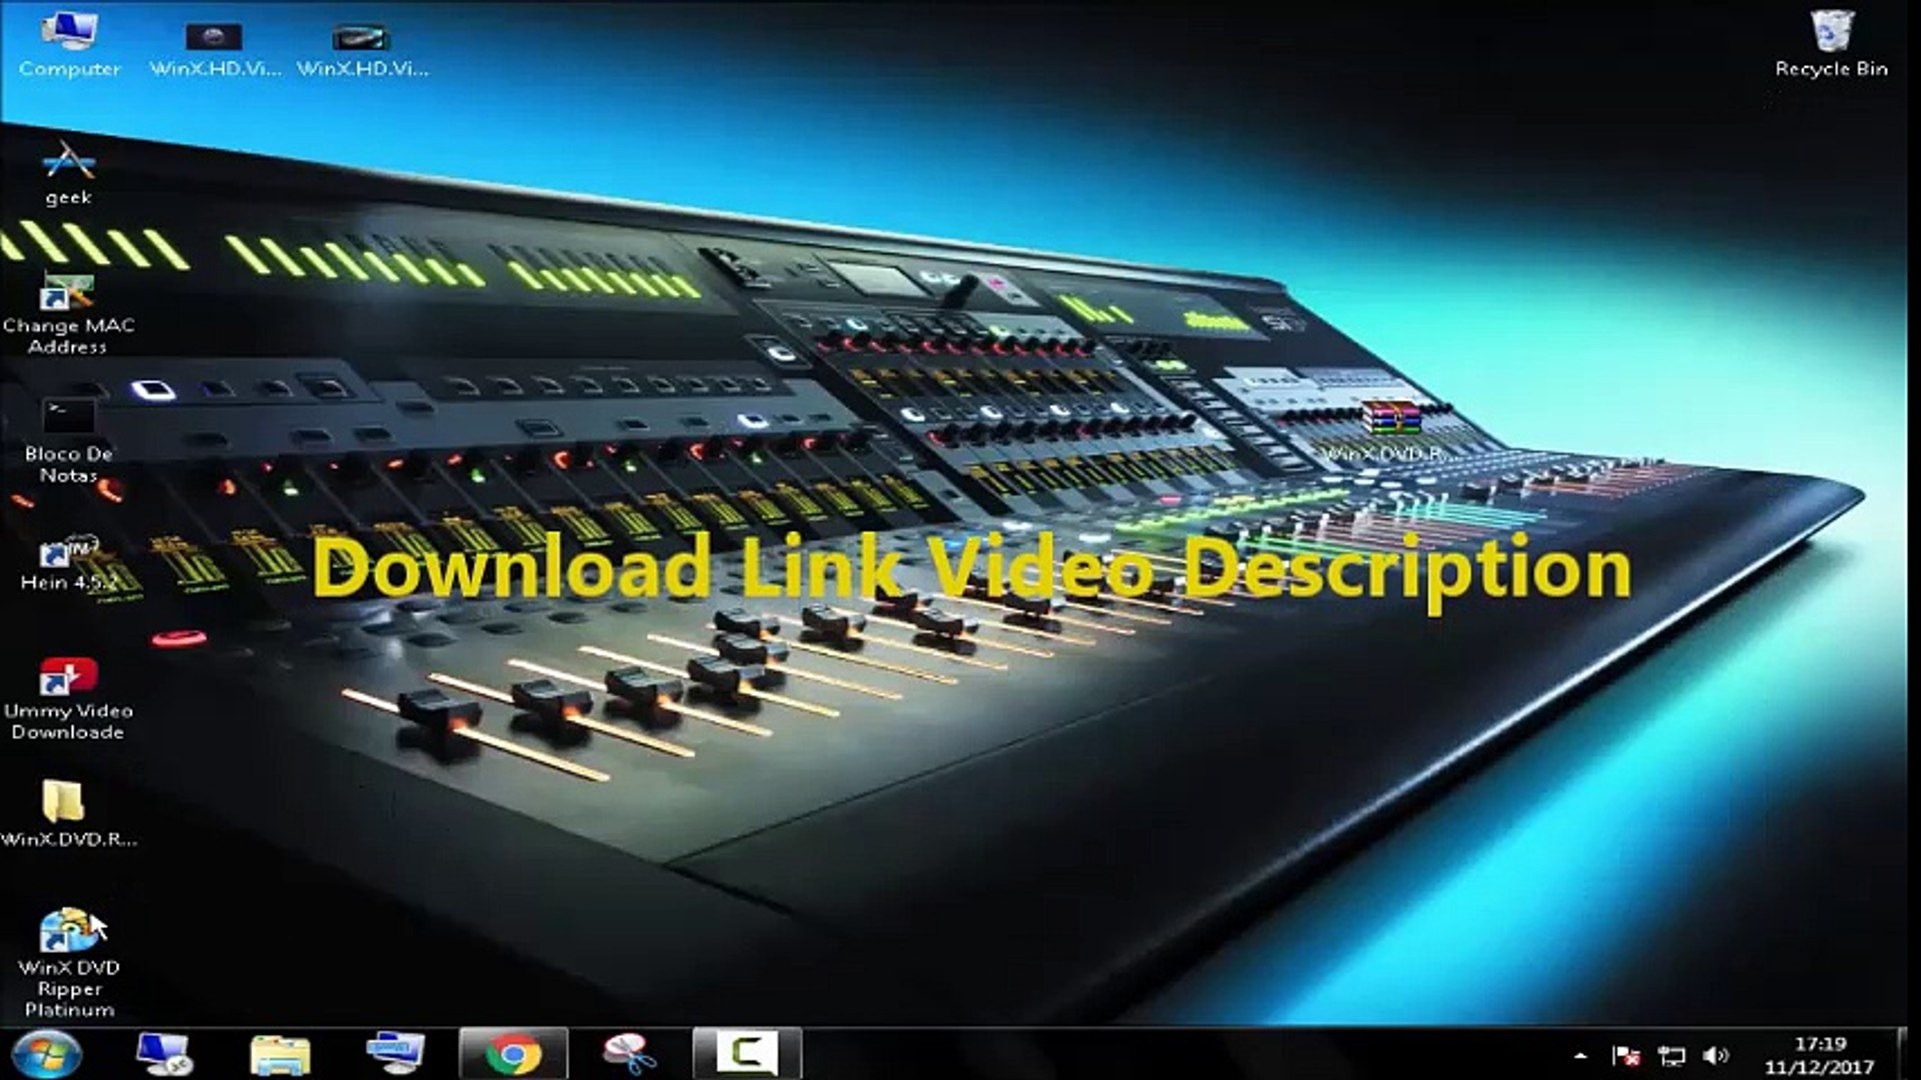 WinX DVD Ripper Platinum 8 8 0 208 Keygen 2018